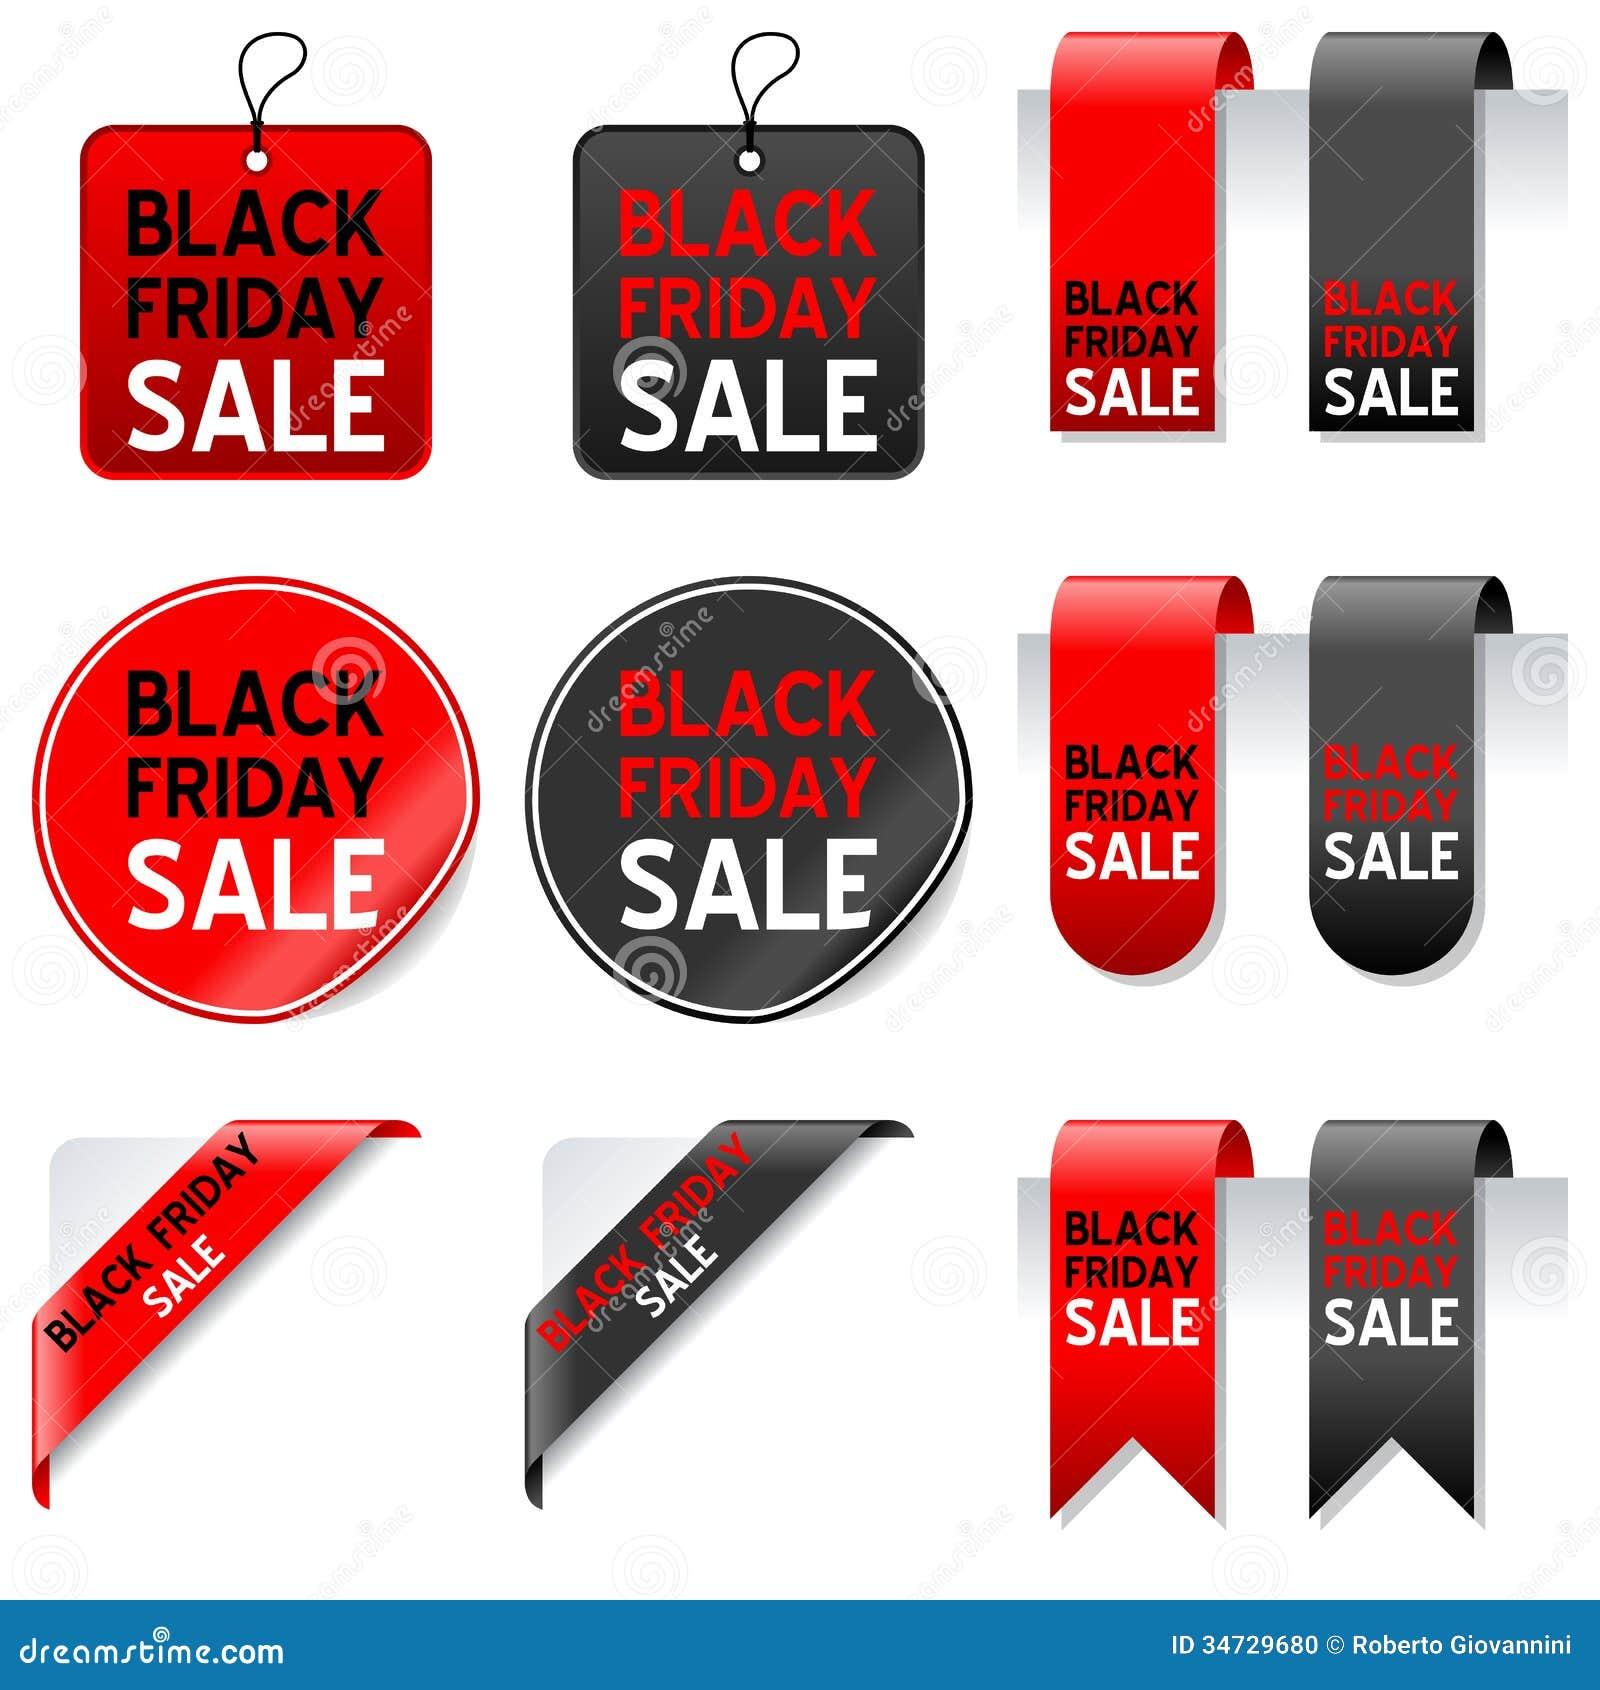 Black friday sale elements set